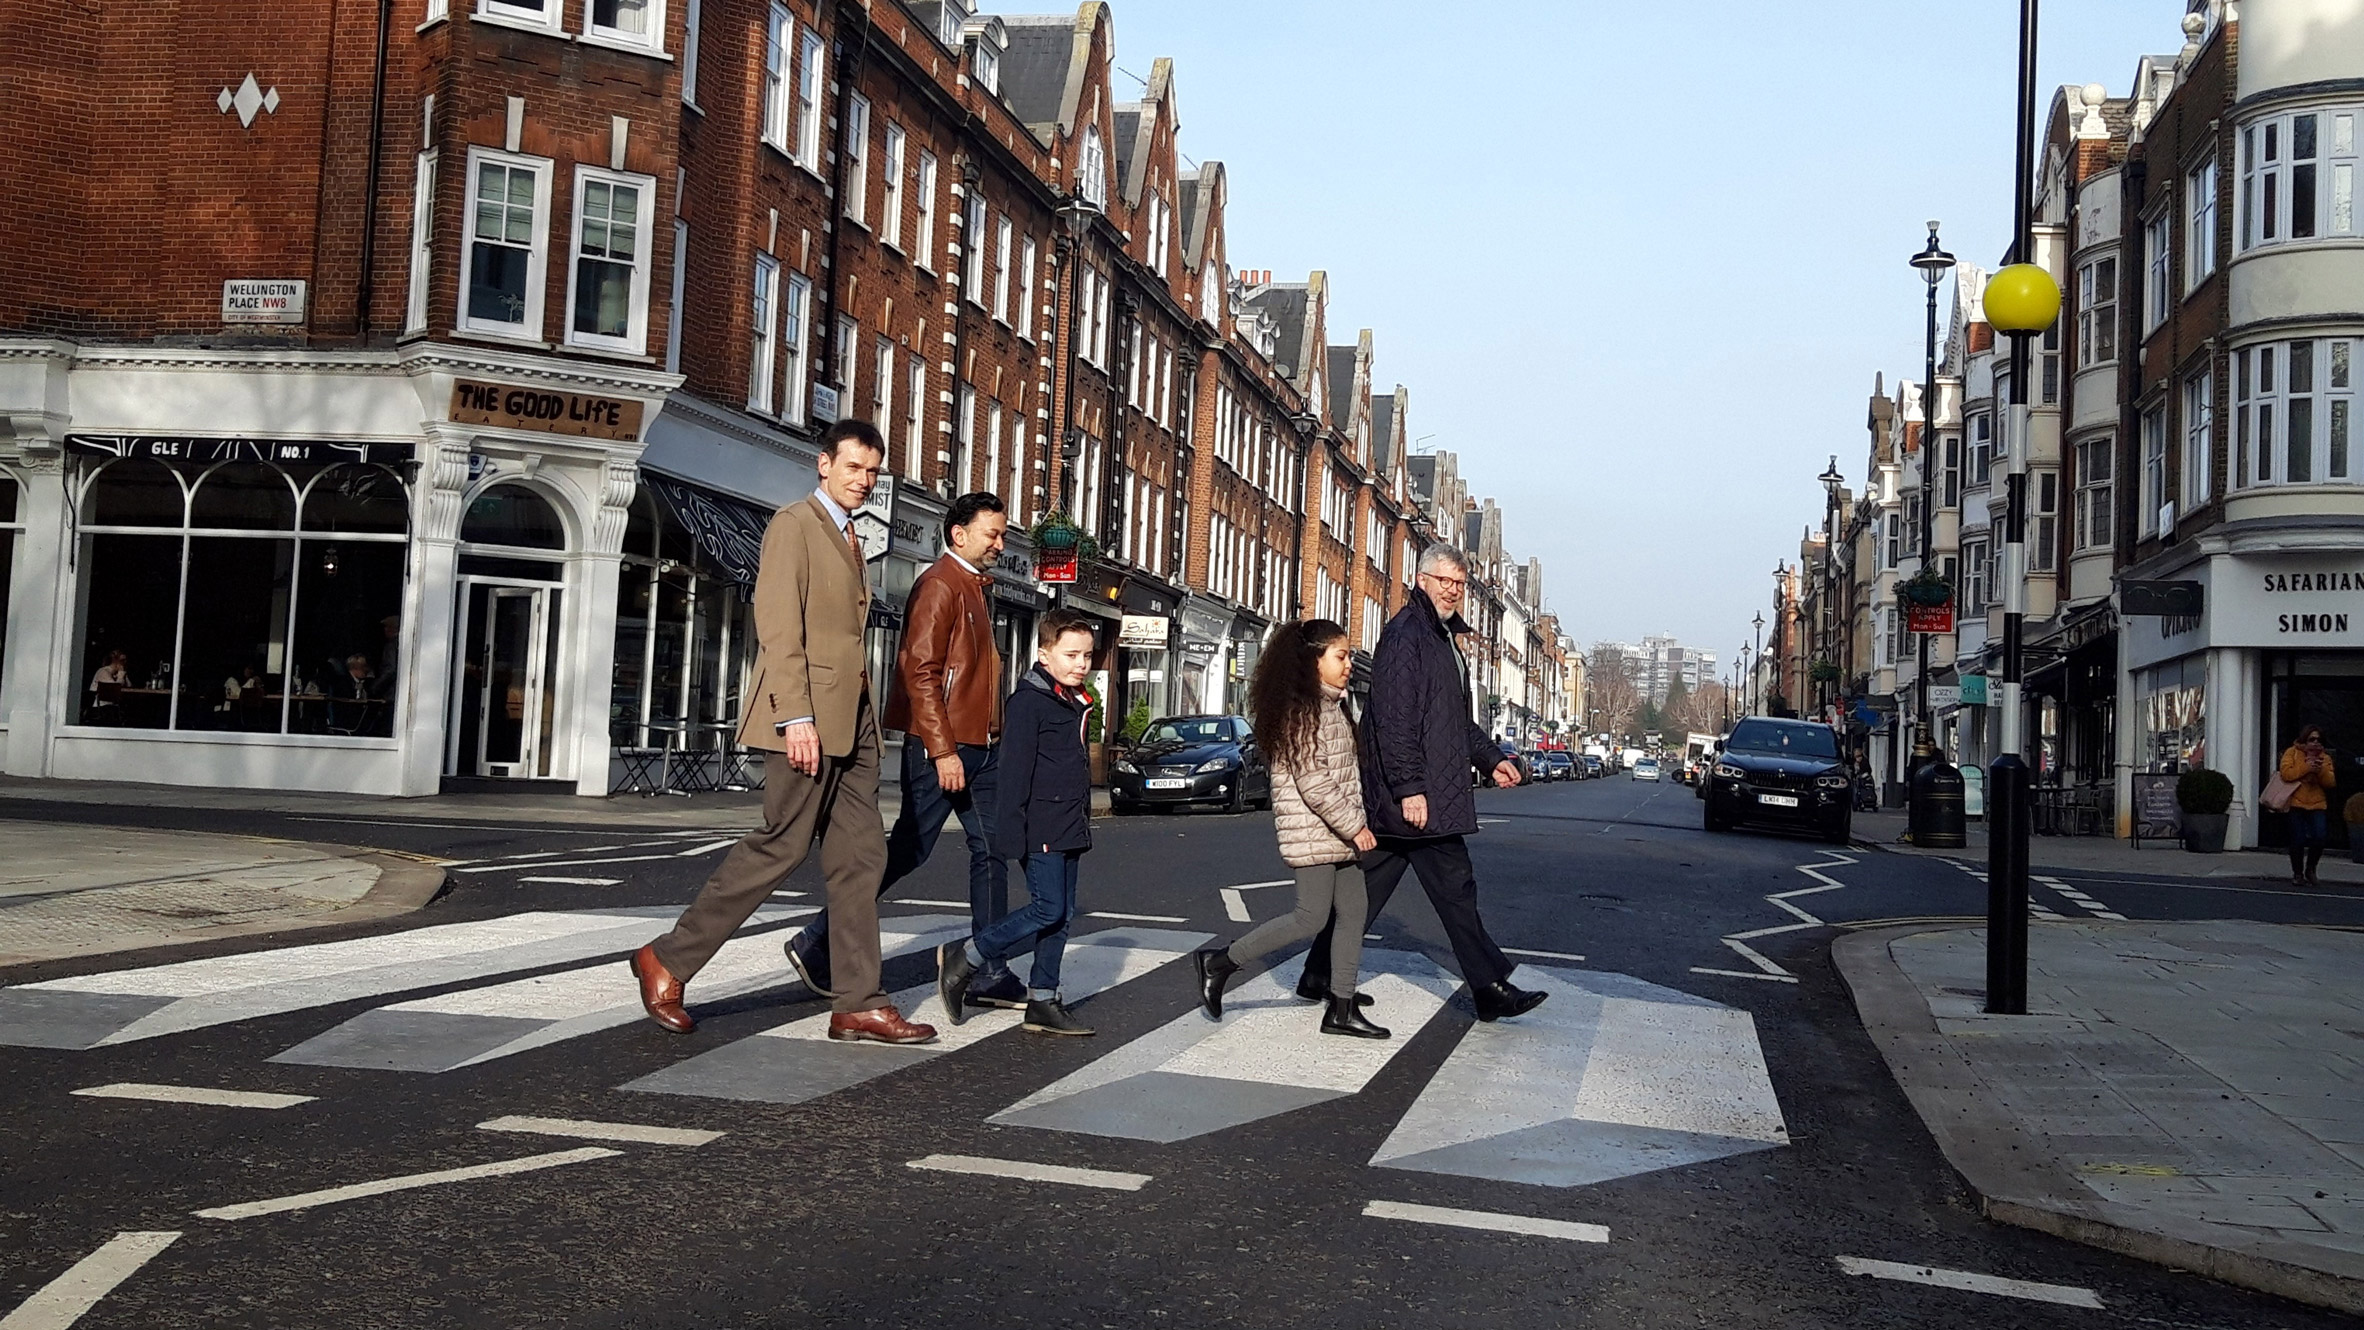 This week on Dezeen: London's first 3D zebra crossing